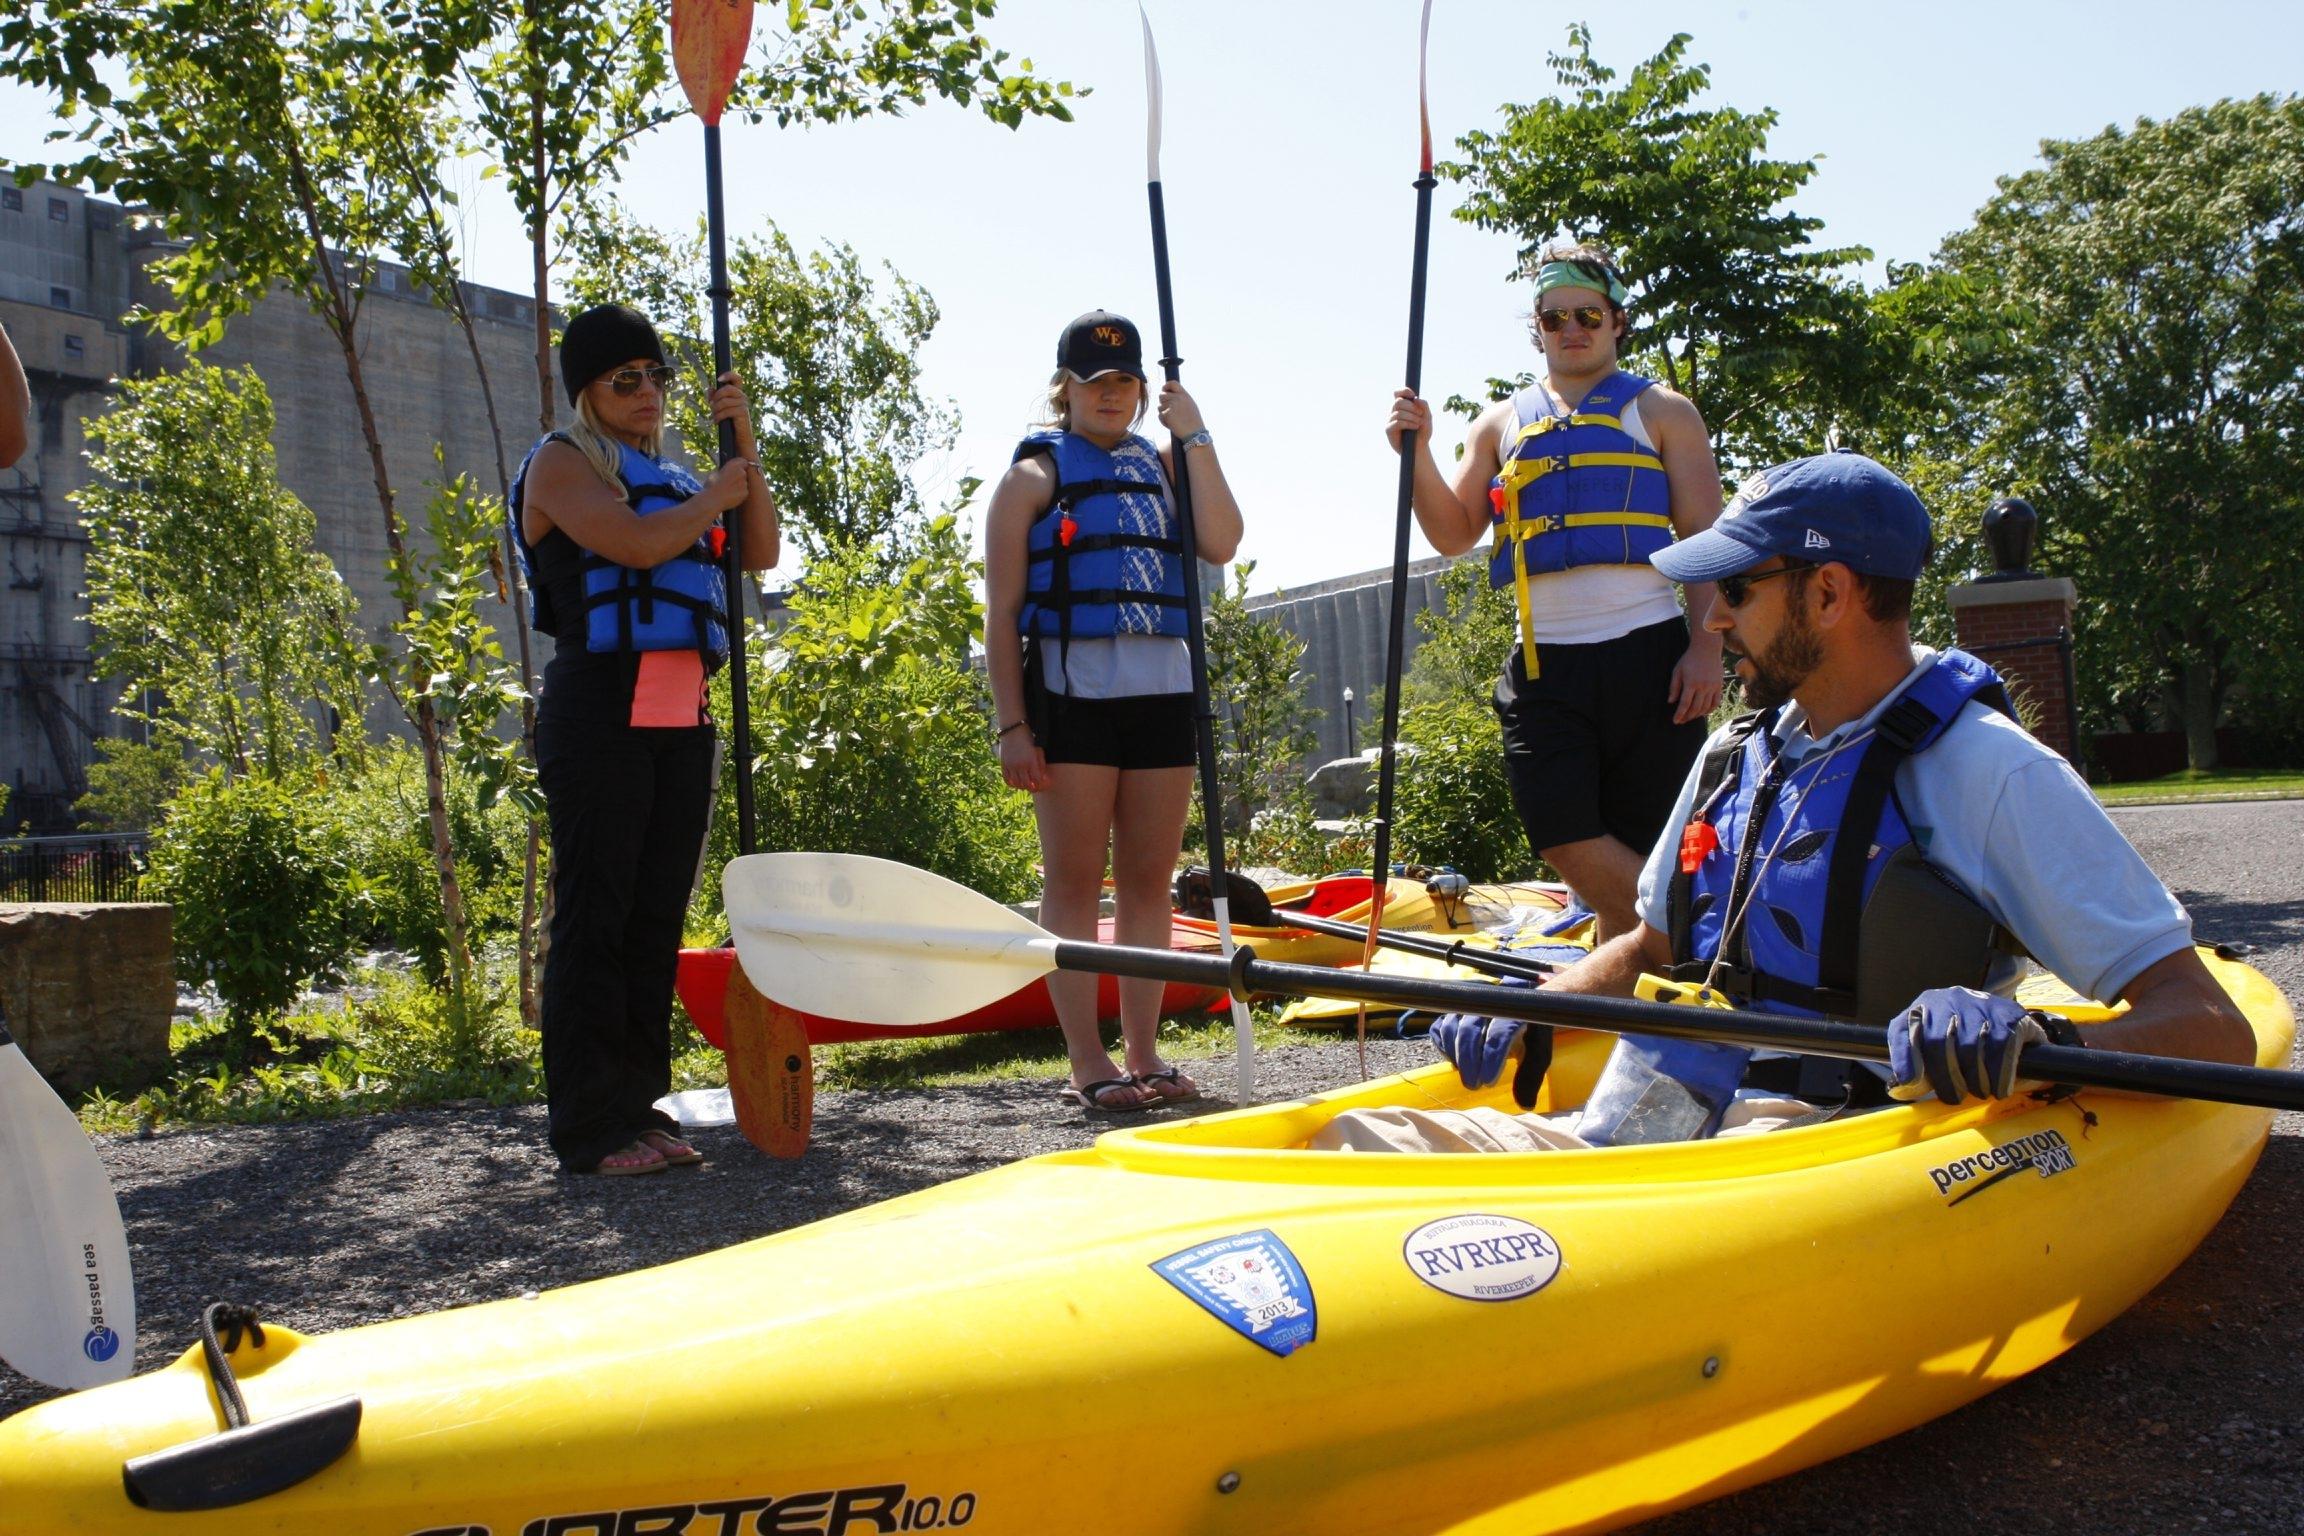 Chris Murawski teaches novice oar-wielders before heading out on the Buffalo River.